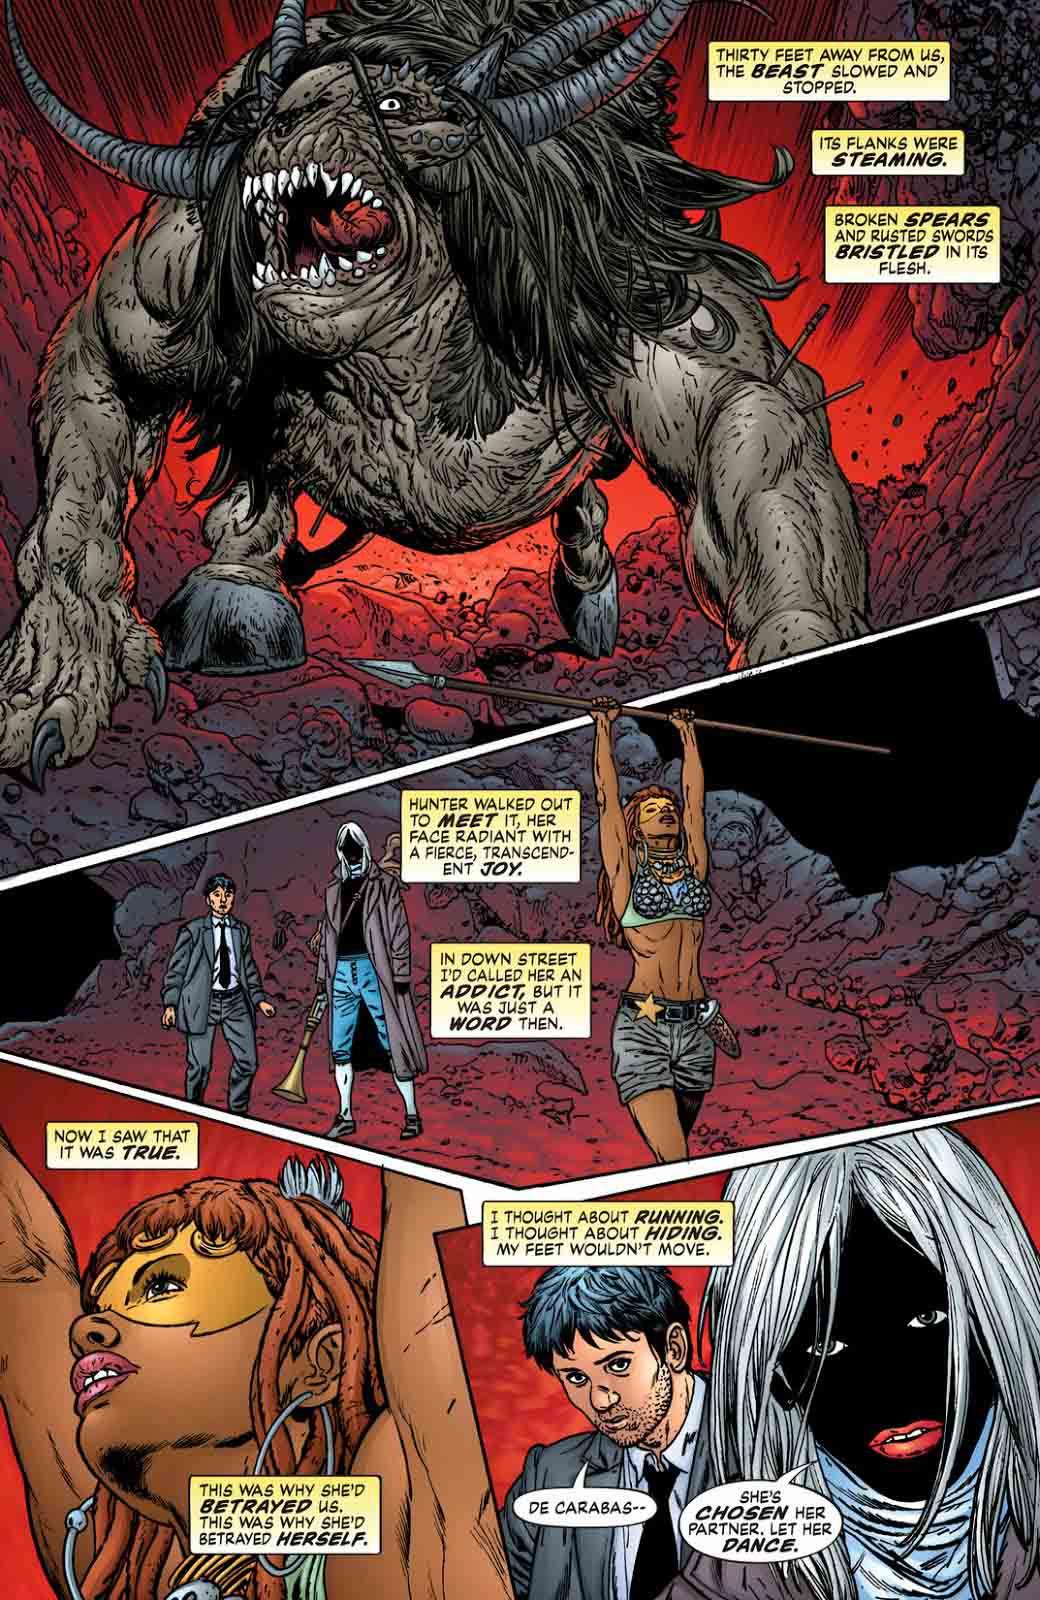 Golem-Comics-resena-neverwhere-de-neil-gaiman-05